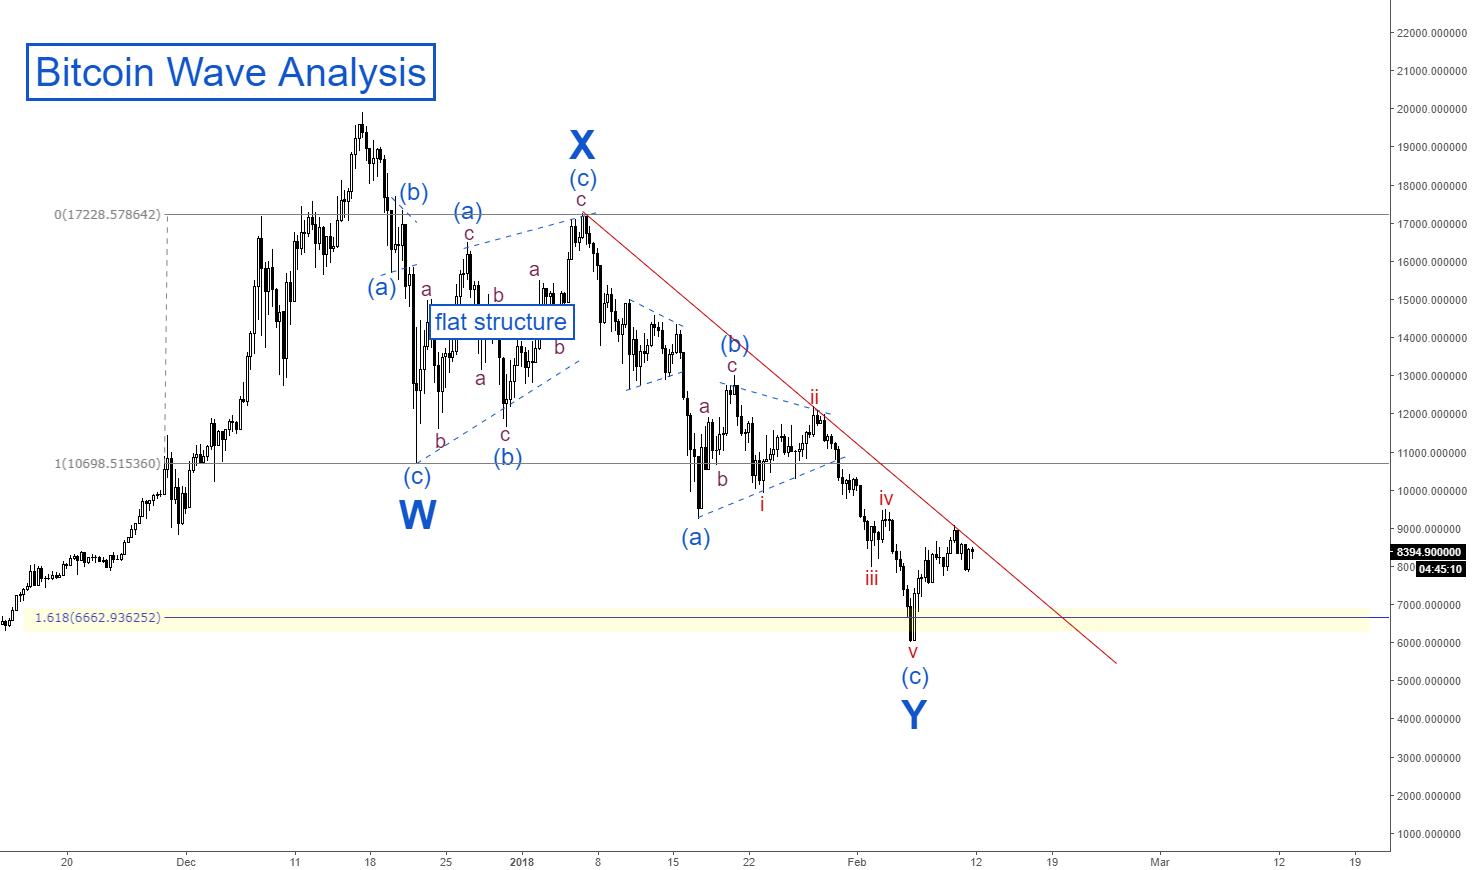 Bitcoin Wave Analysis - (WXY)